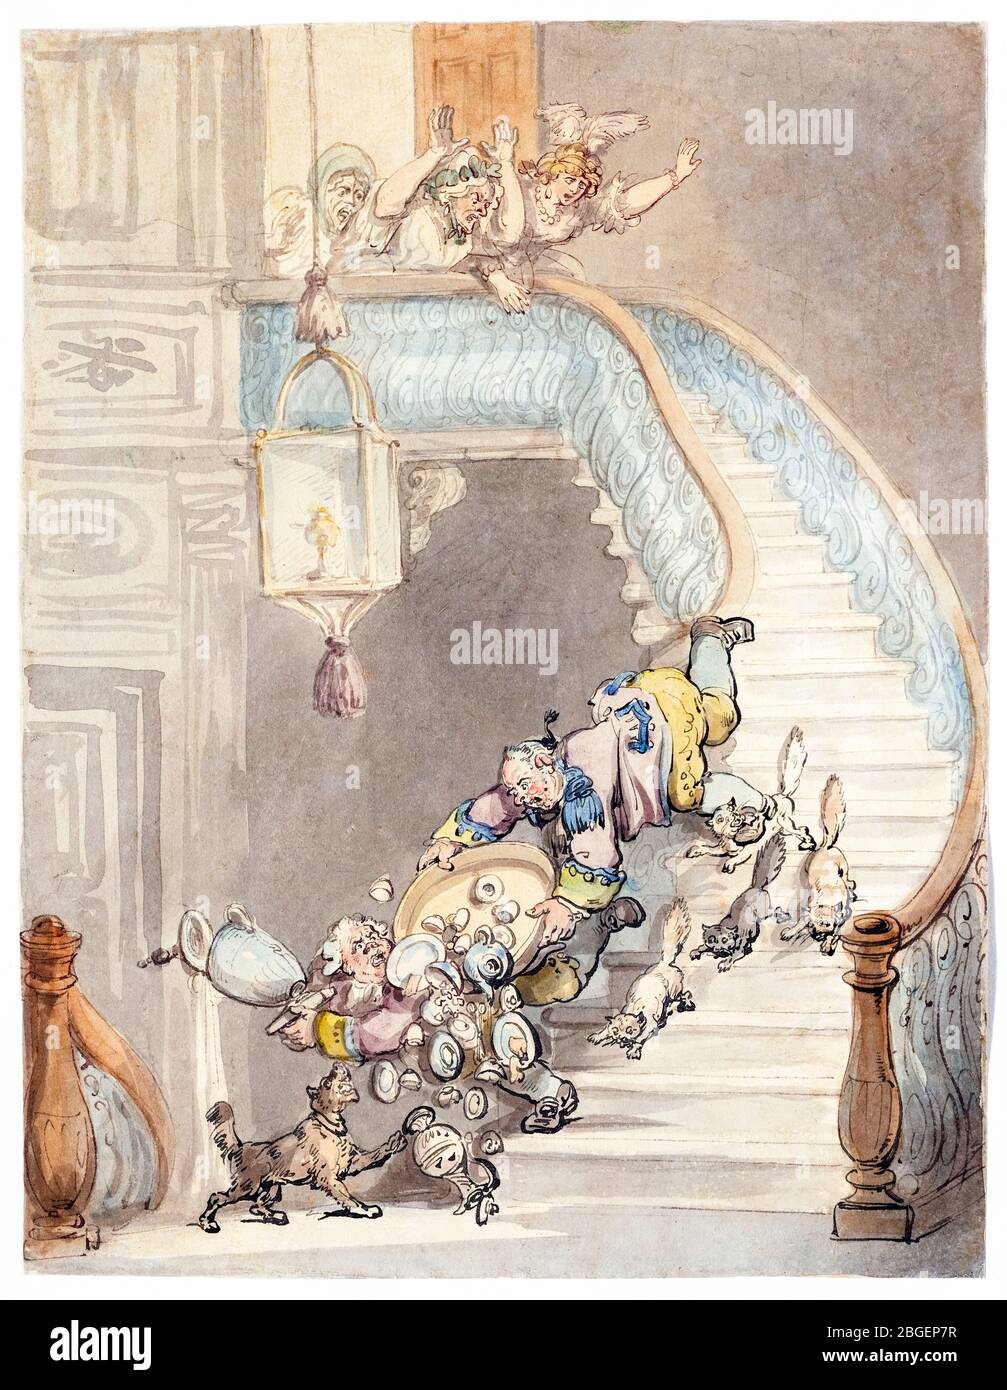 Abuelas Maduras abuelas caricatura fotos e imágenes de stock - alamy